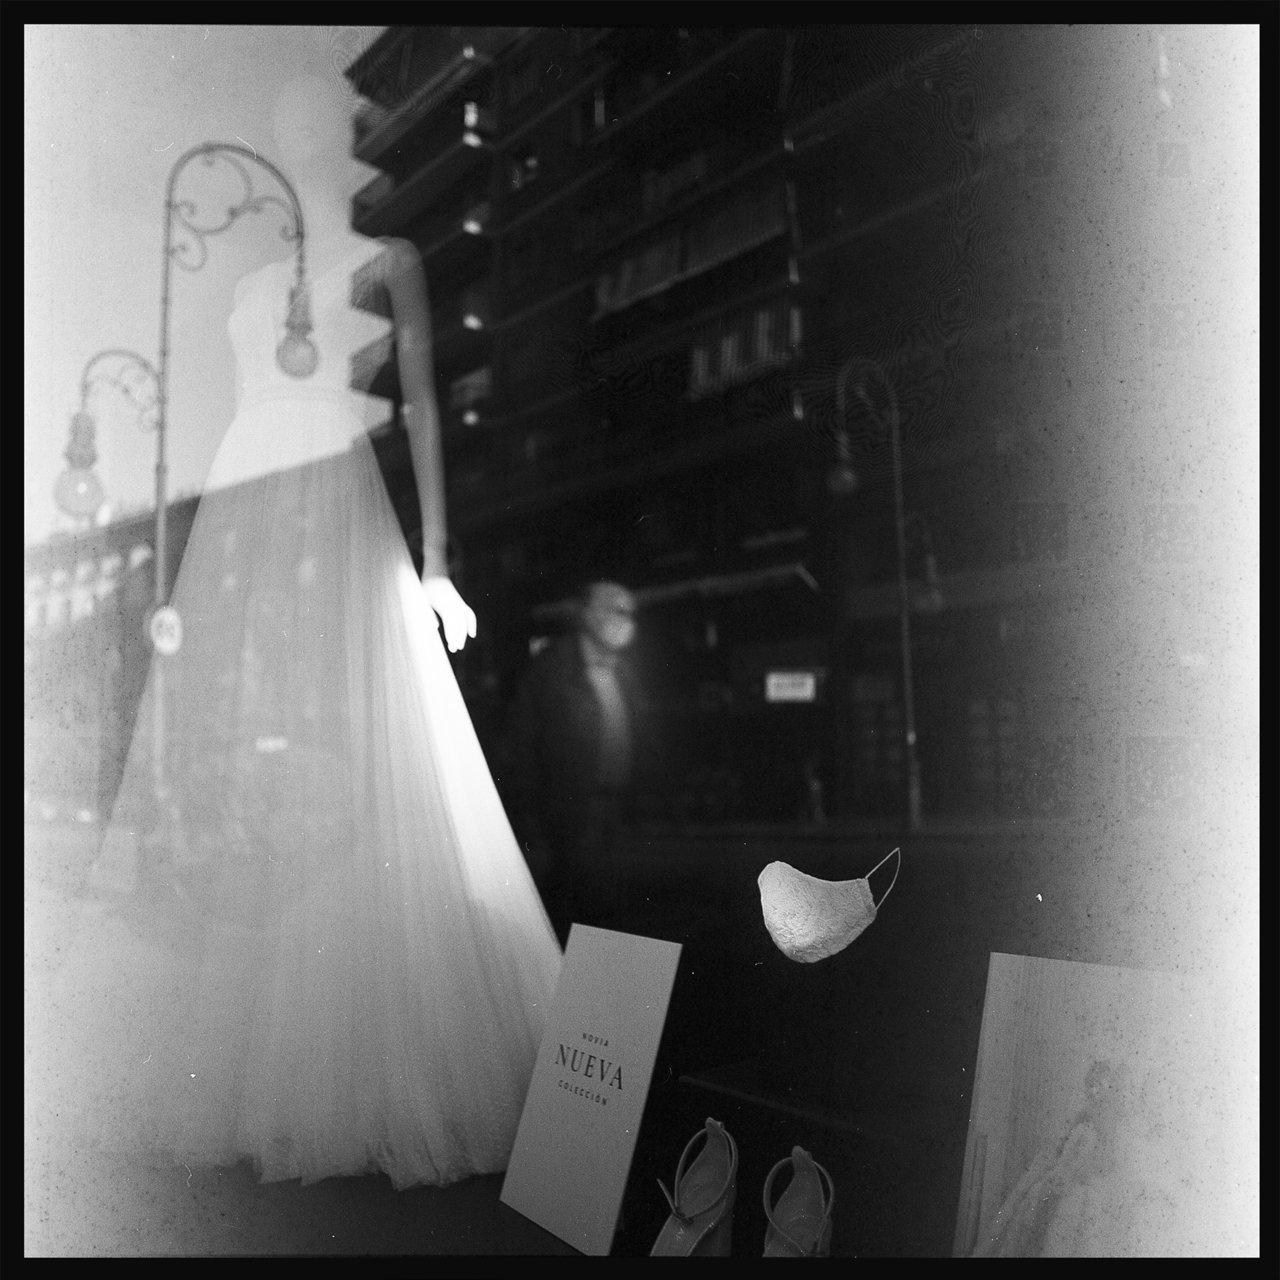 Целуването на булката се отменя... | Author J Stoyanov - jey6 | PHOTO FORUM